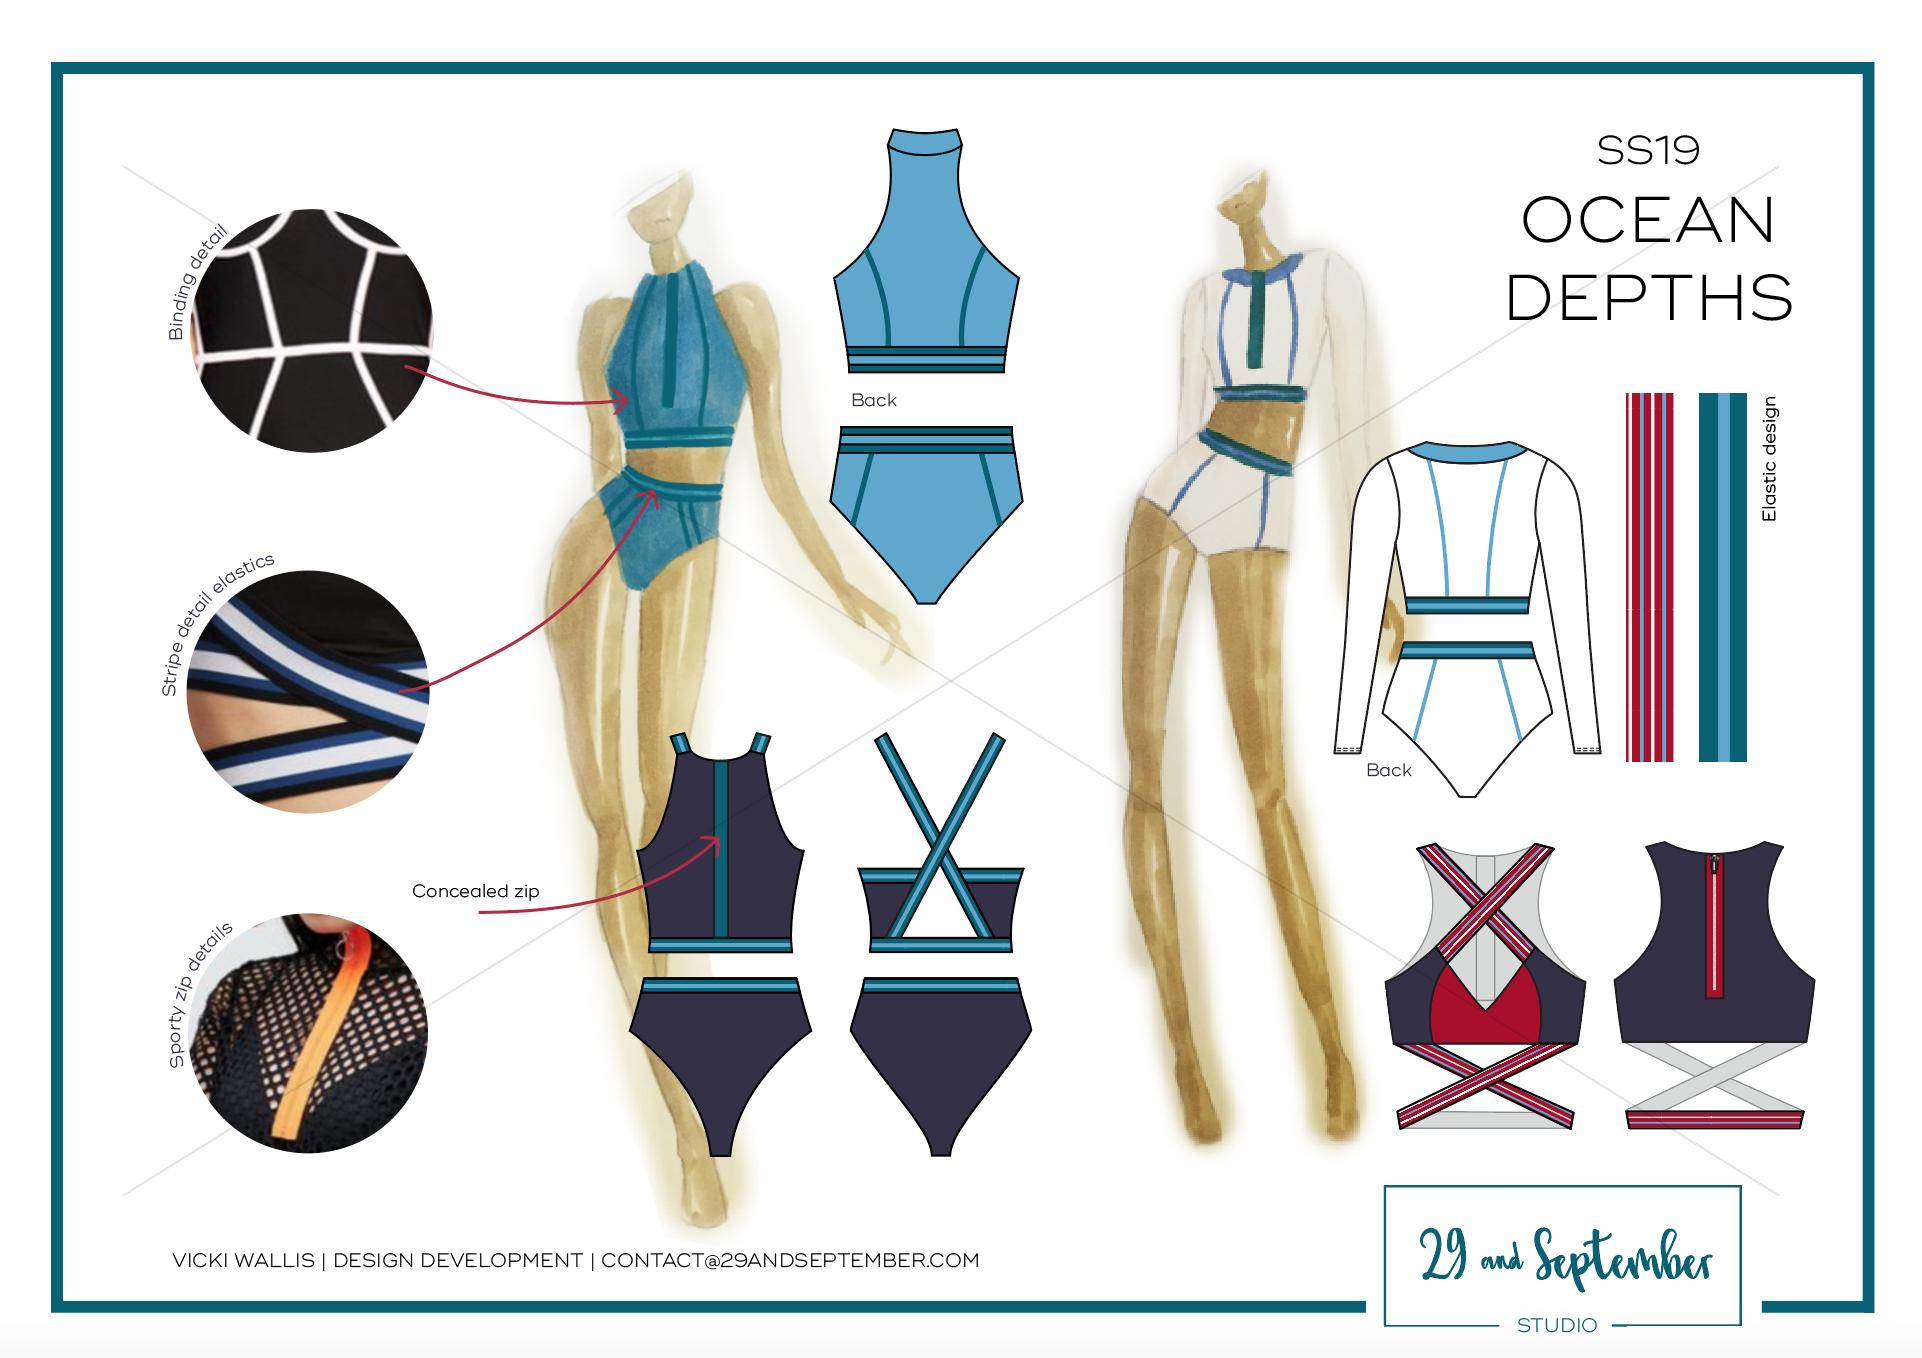 29andSeptember Studio design + technical drawings | swimwear trends